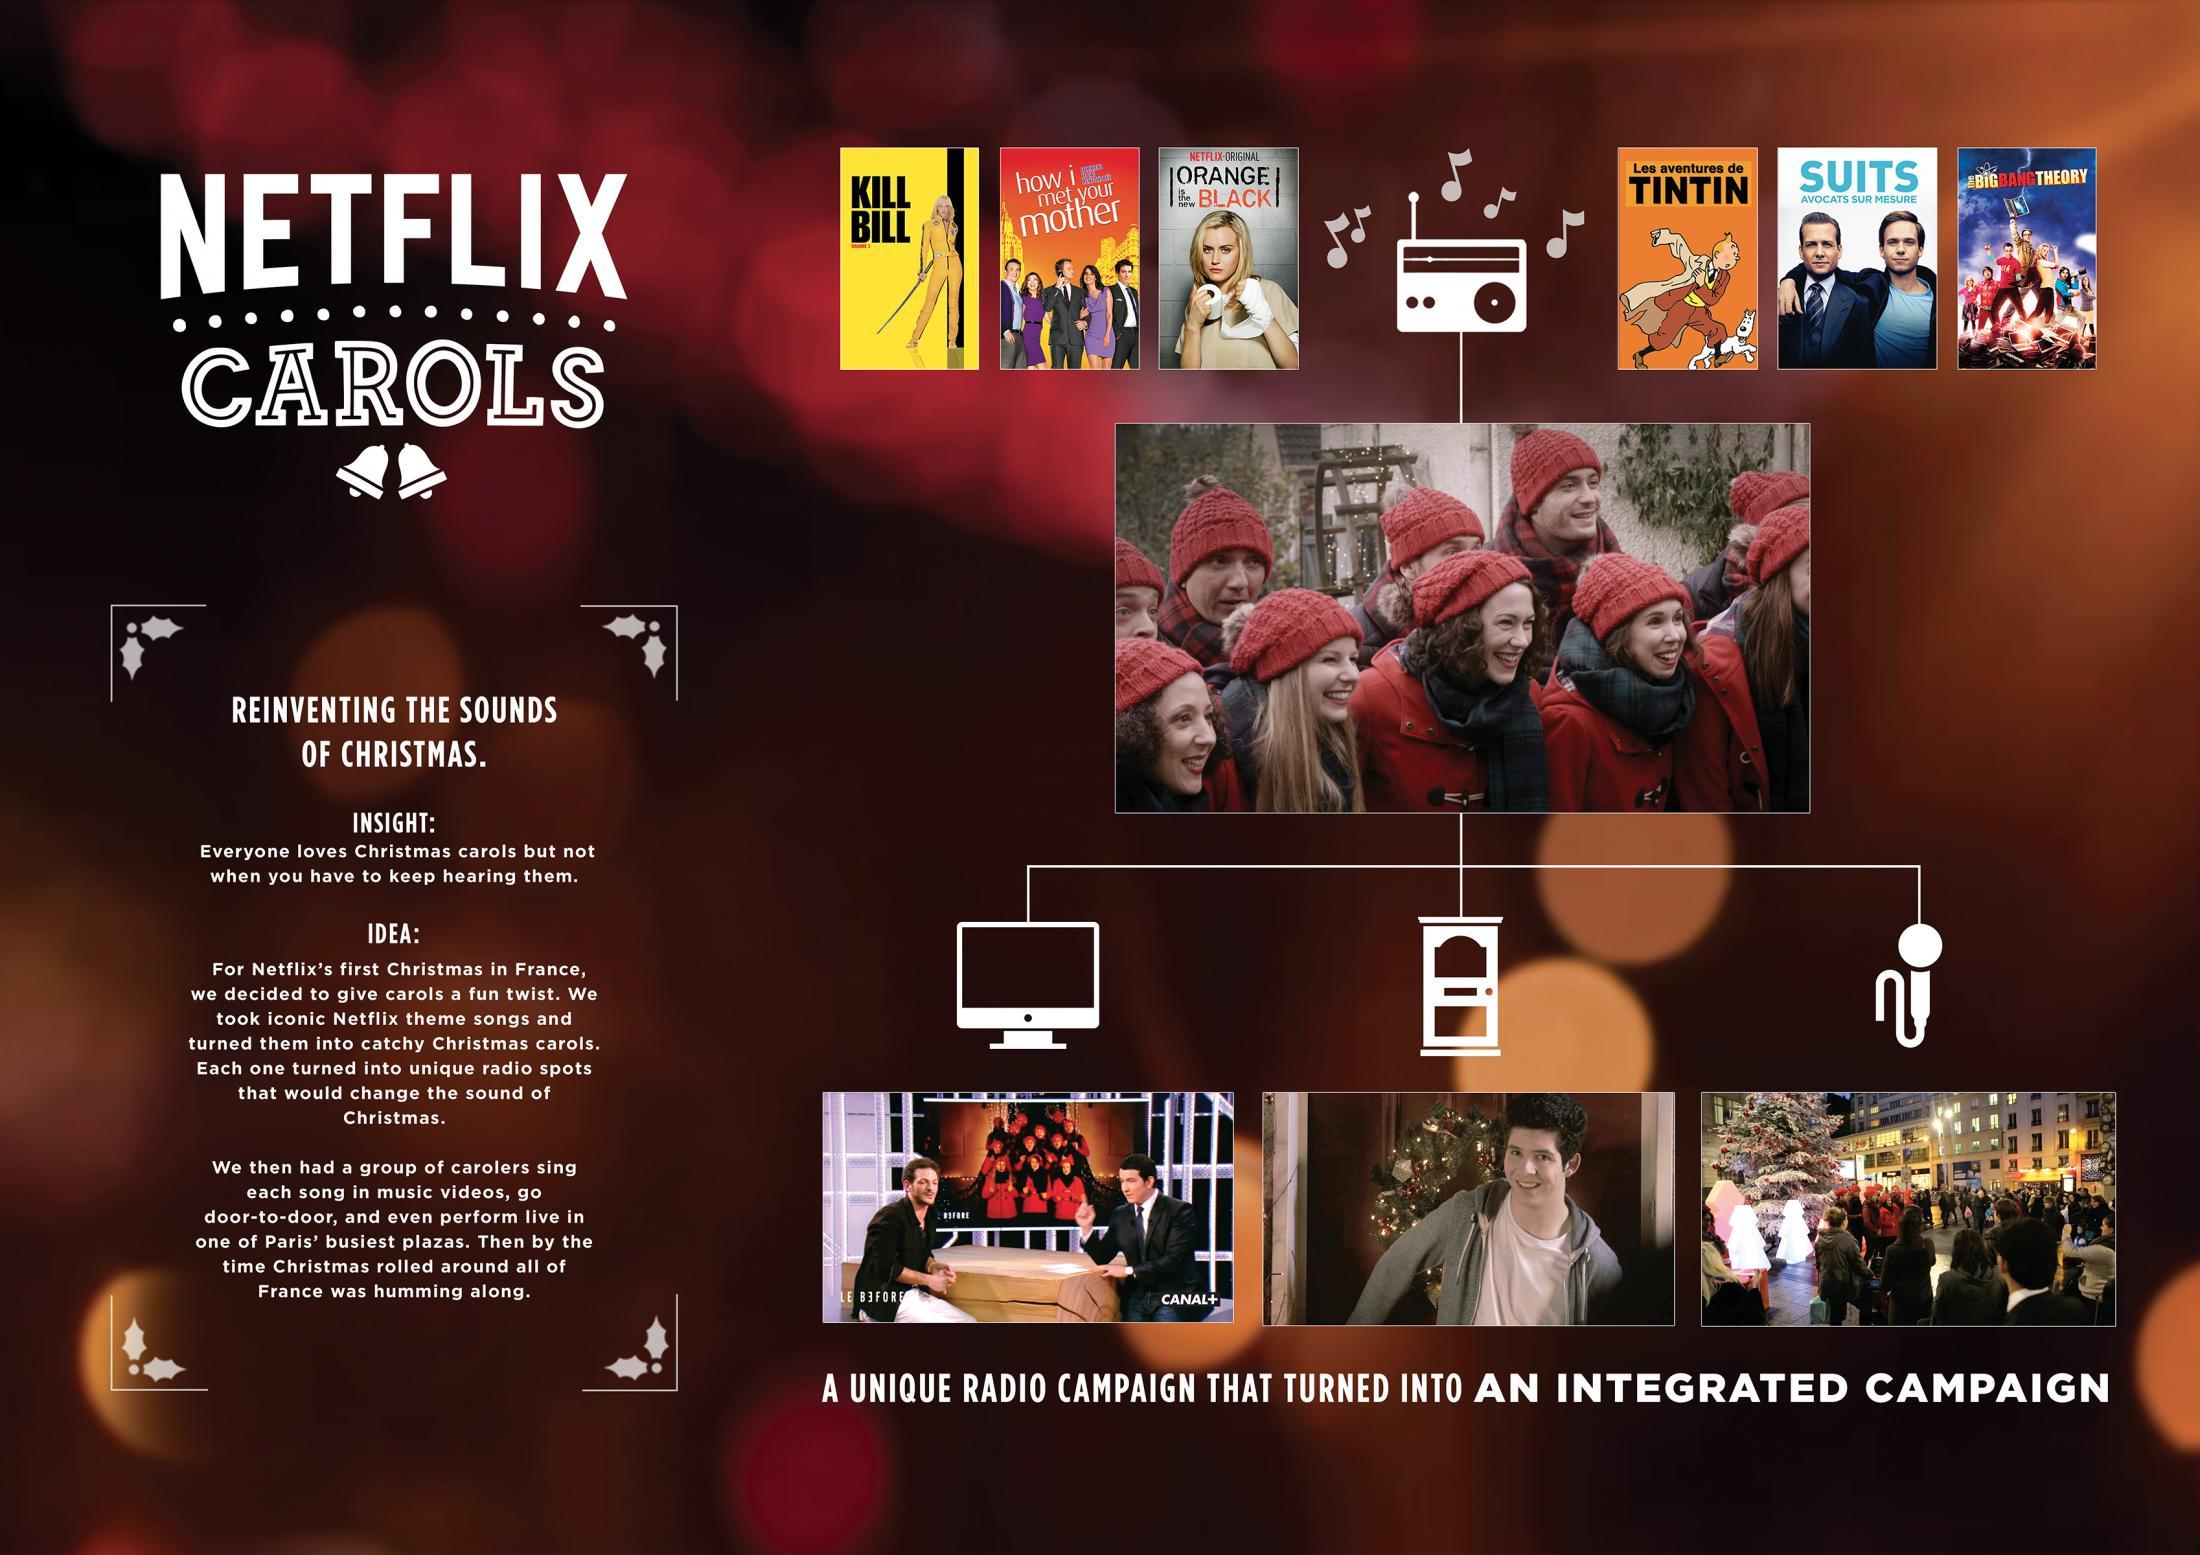 Thumbnail for NETFLIX CHRISTMAS CAROLS -  KILL BILL